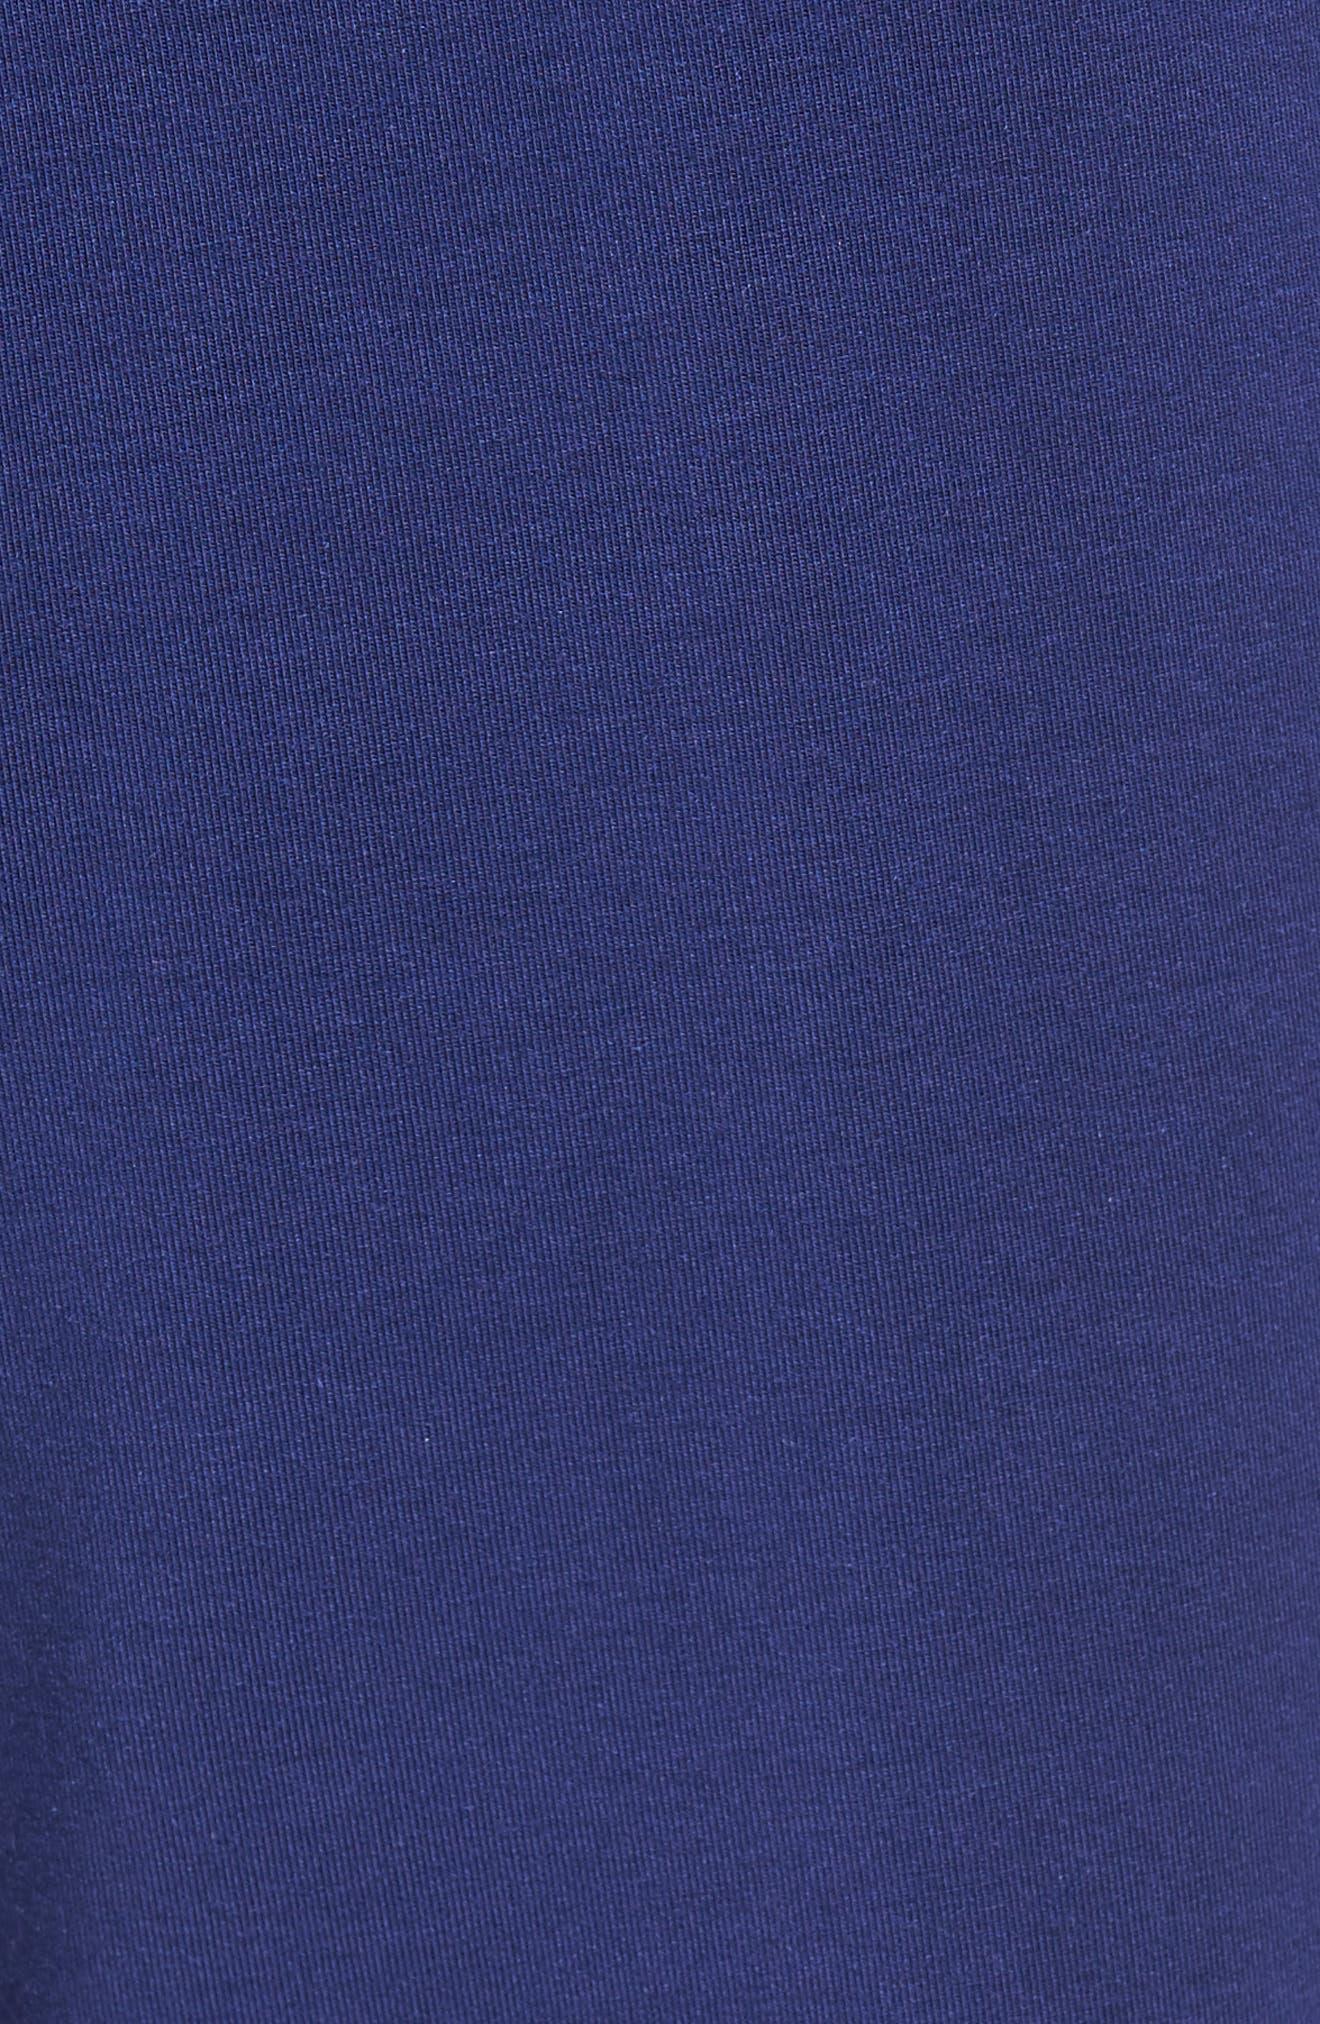 Lounge Shorts,                             Alternate thumbnail 5, color,                             413